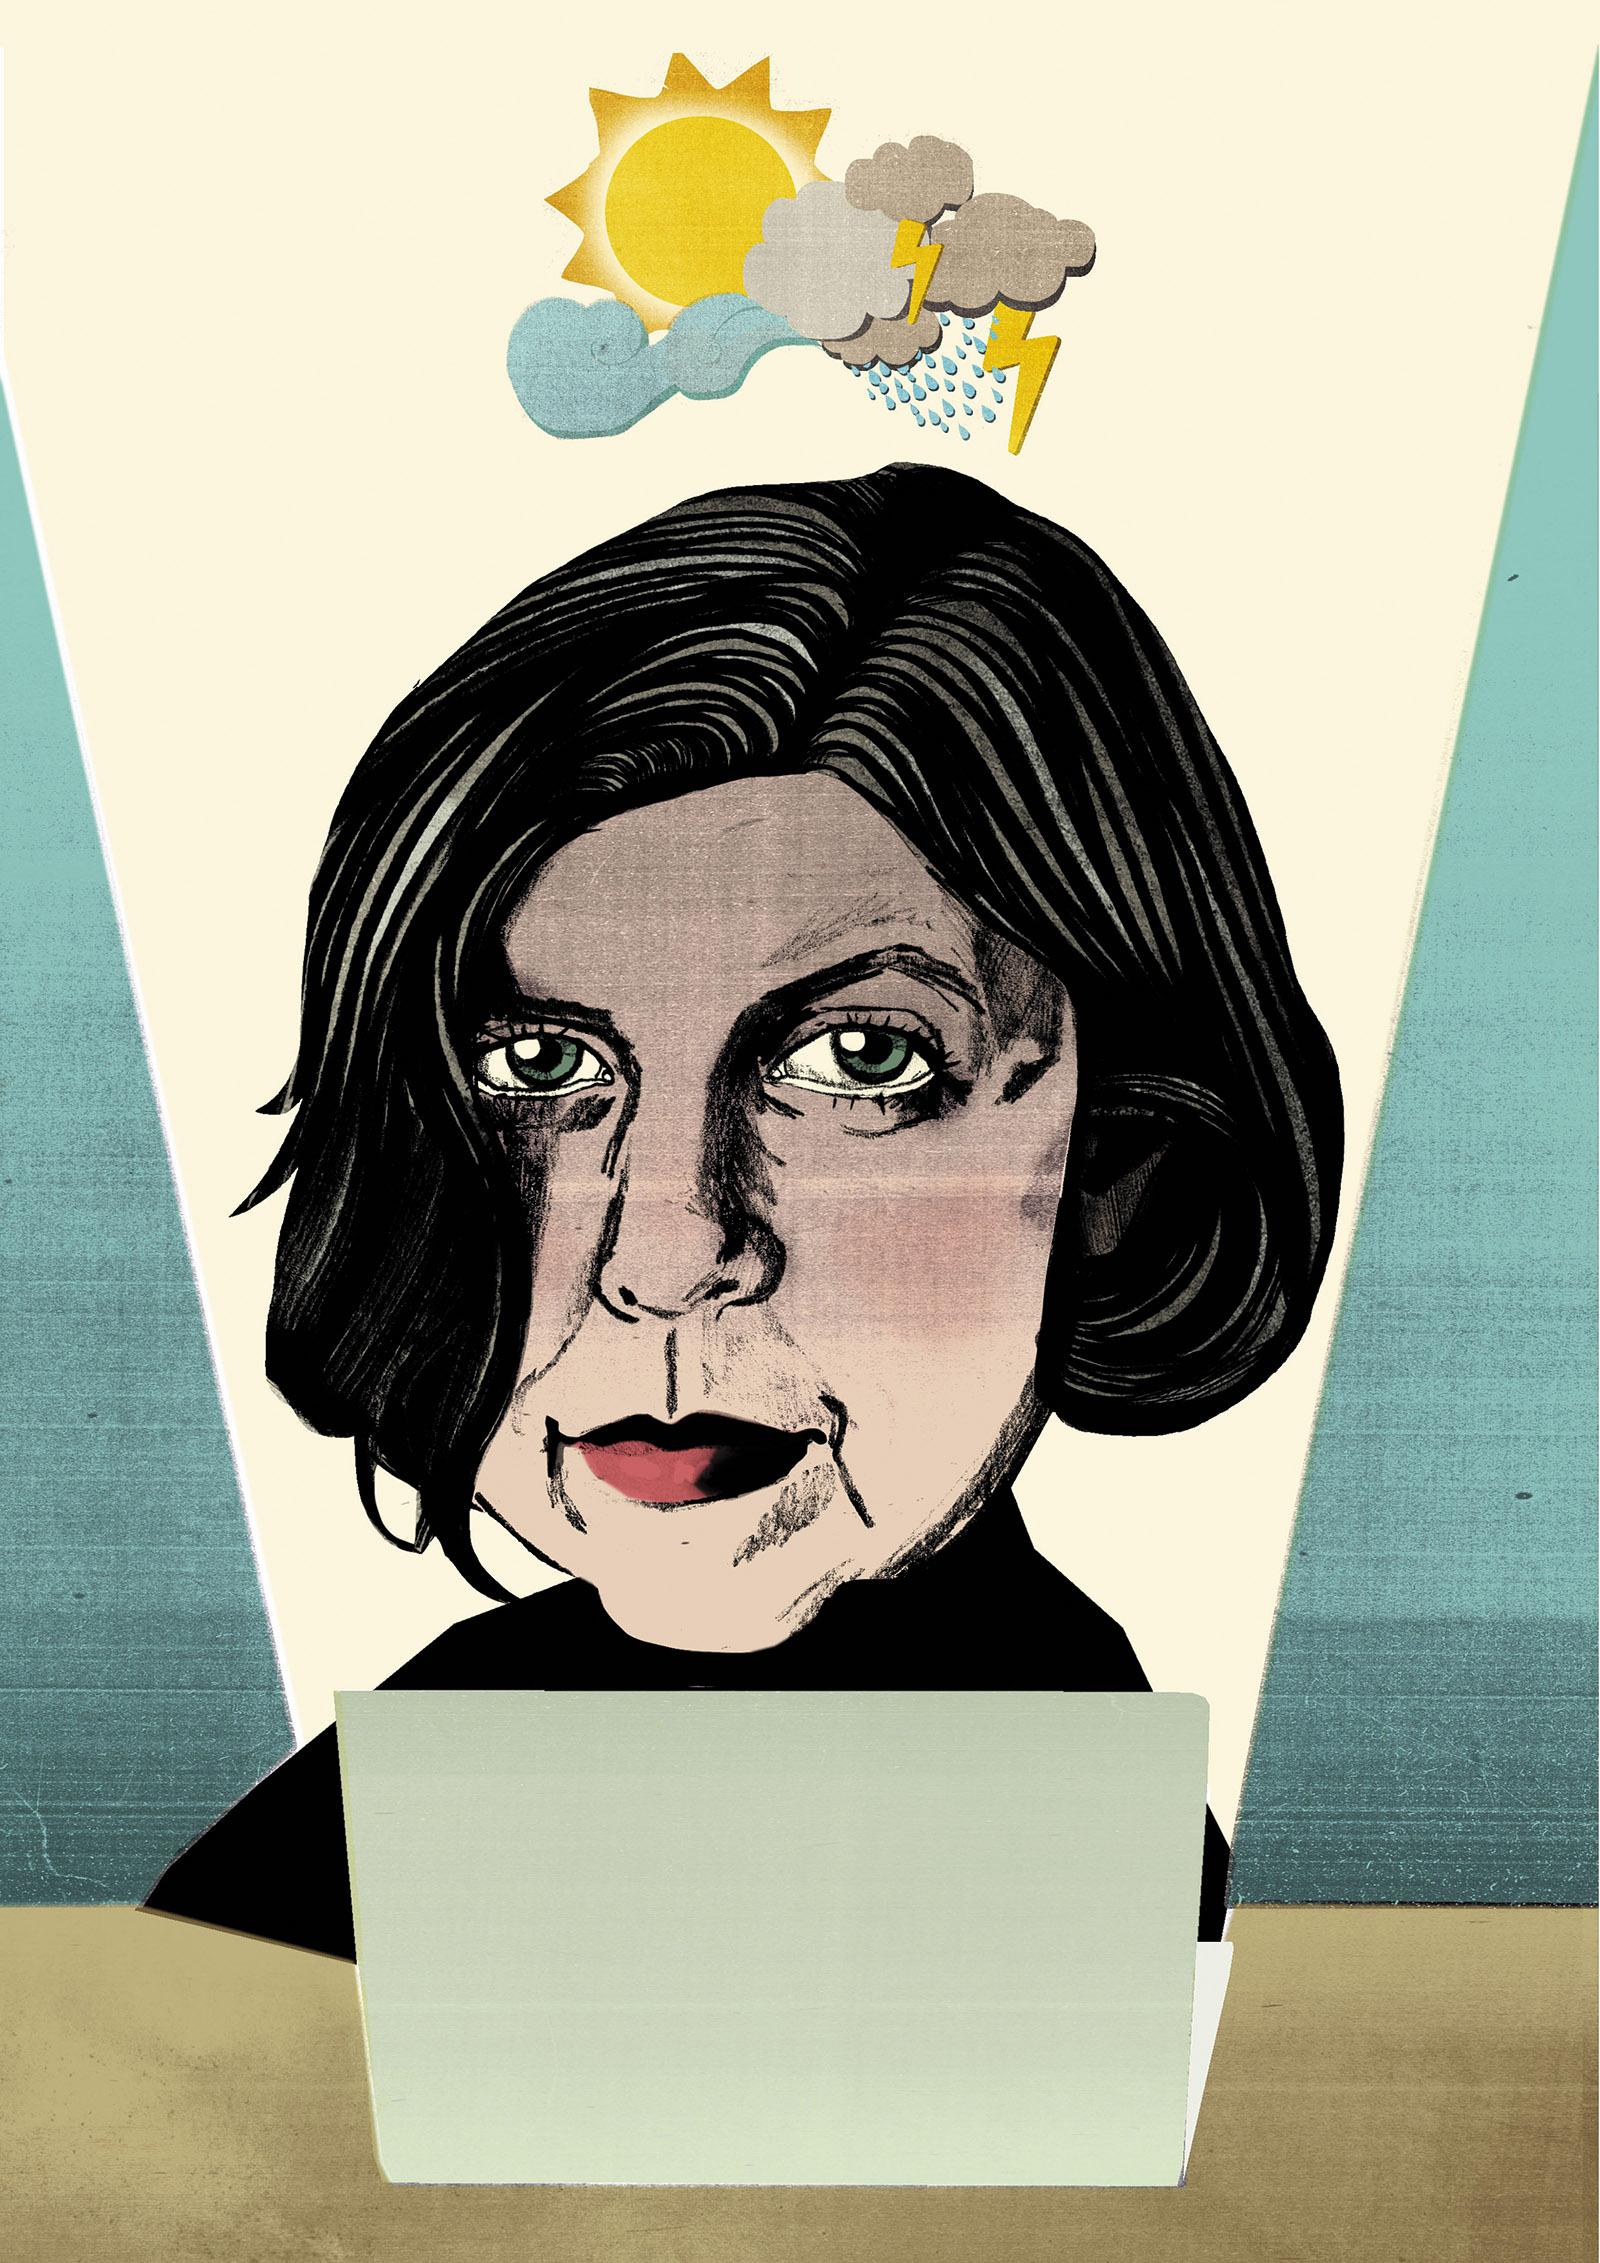 Jenny Offill; illustration by Ellie Foreman-Peck